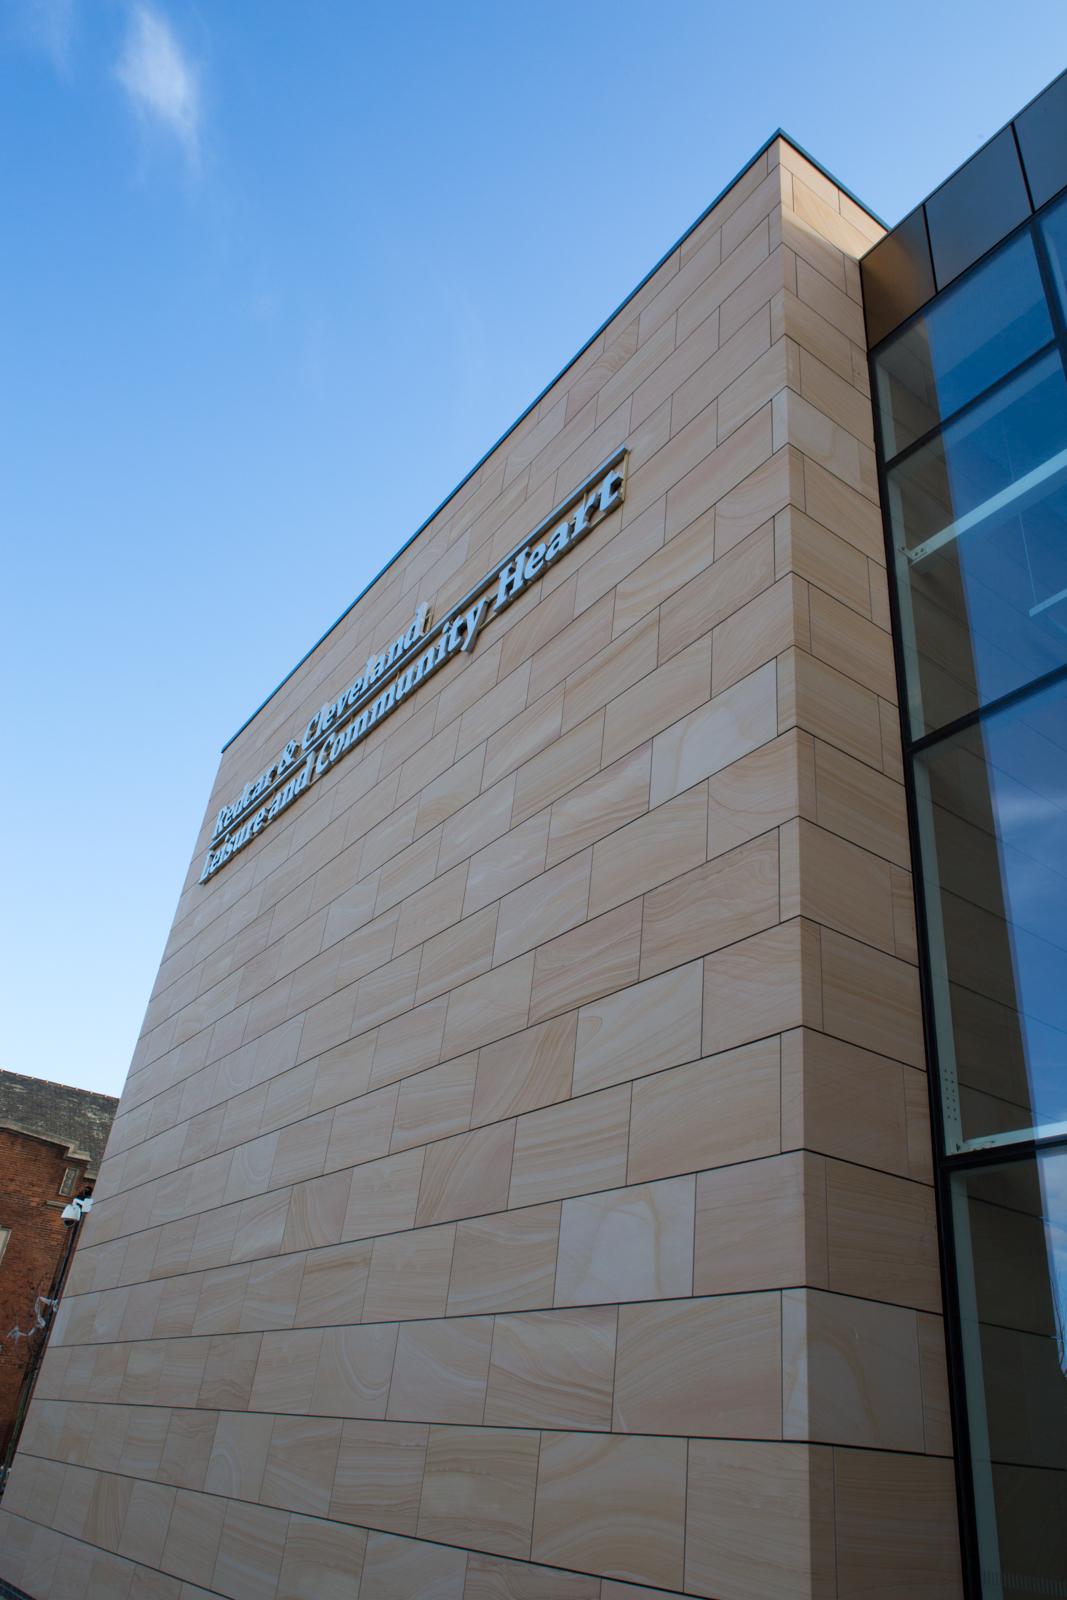 Redcar Leisure Centre Stone